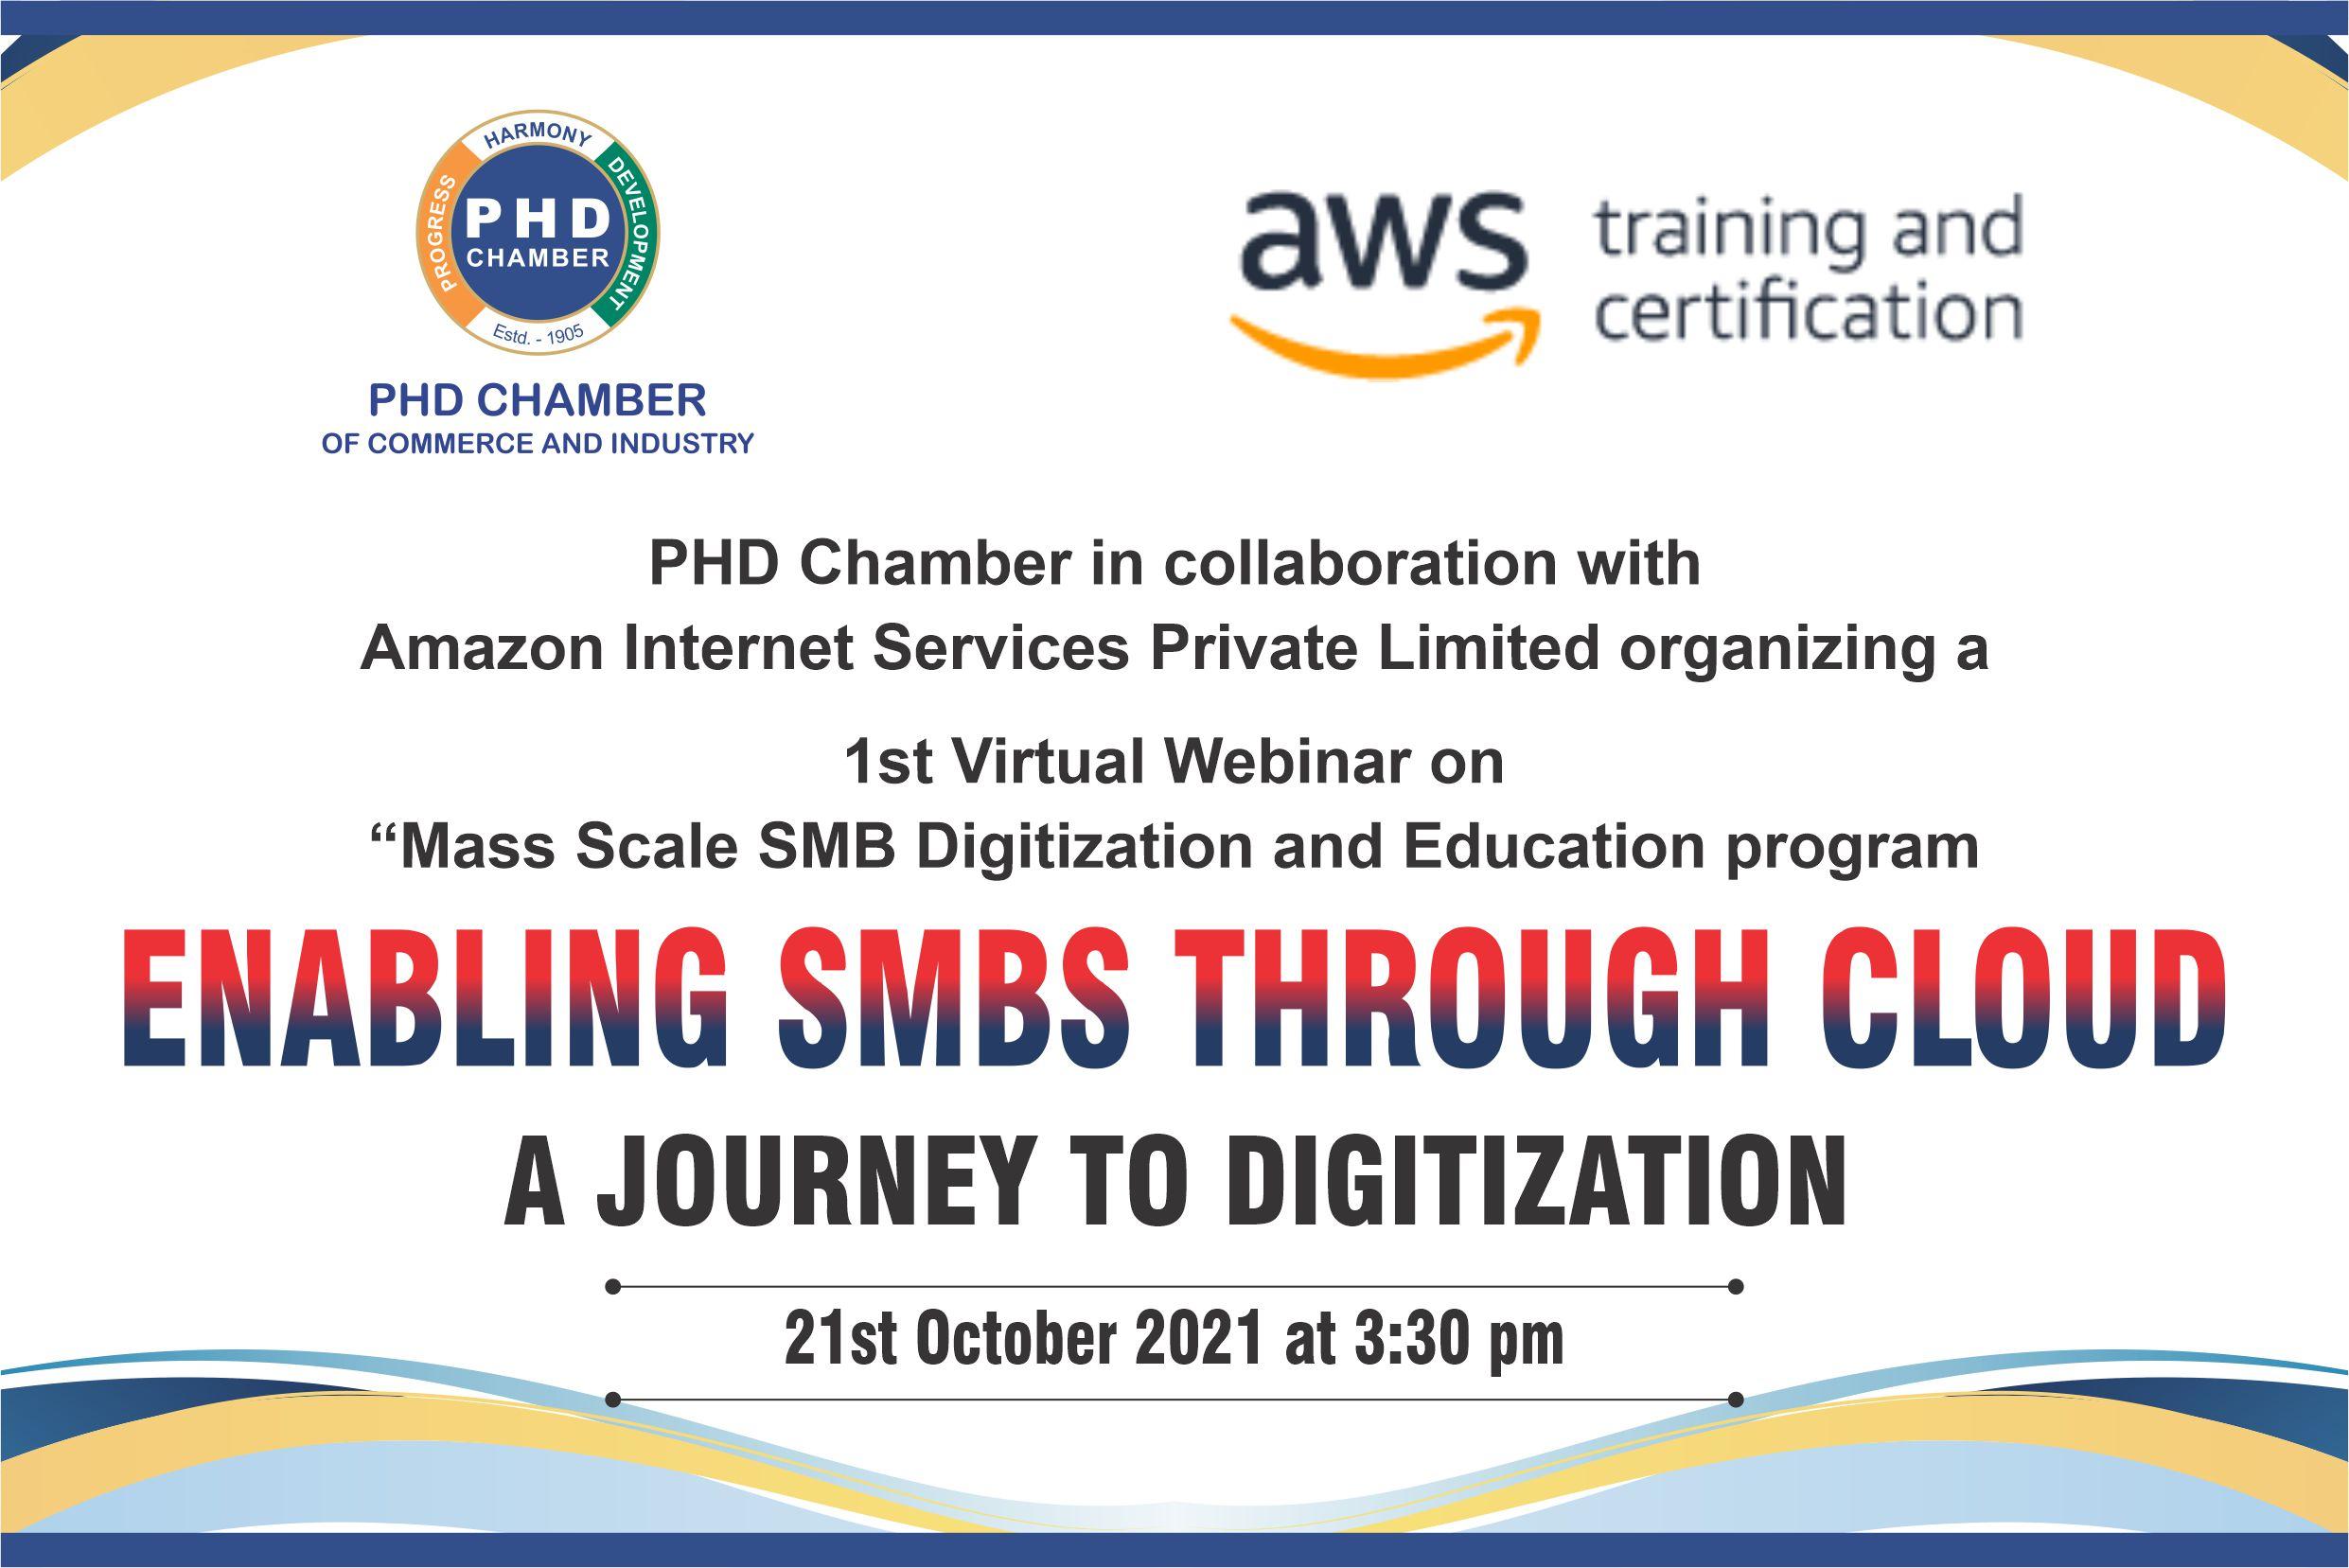 "Series of 1st Virtual Webinar on ""Mass Scale SMB Digitization and Education program"""